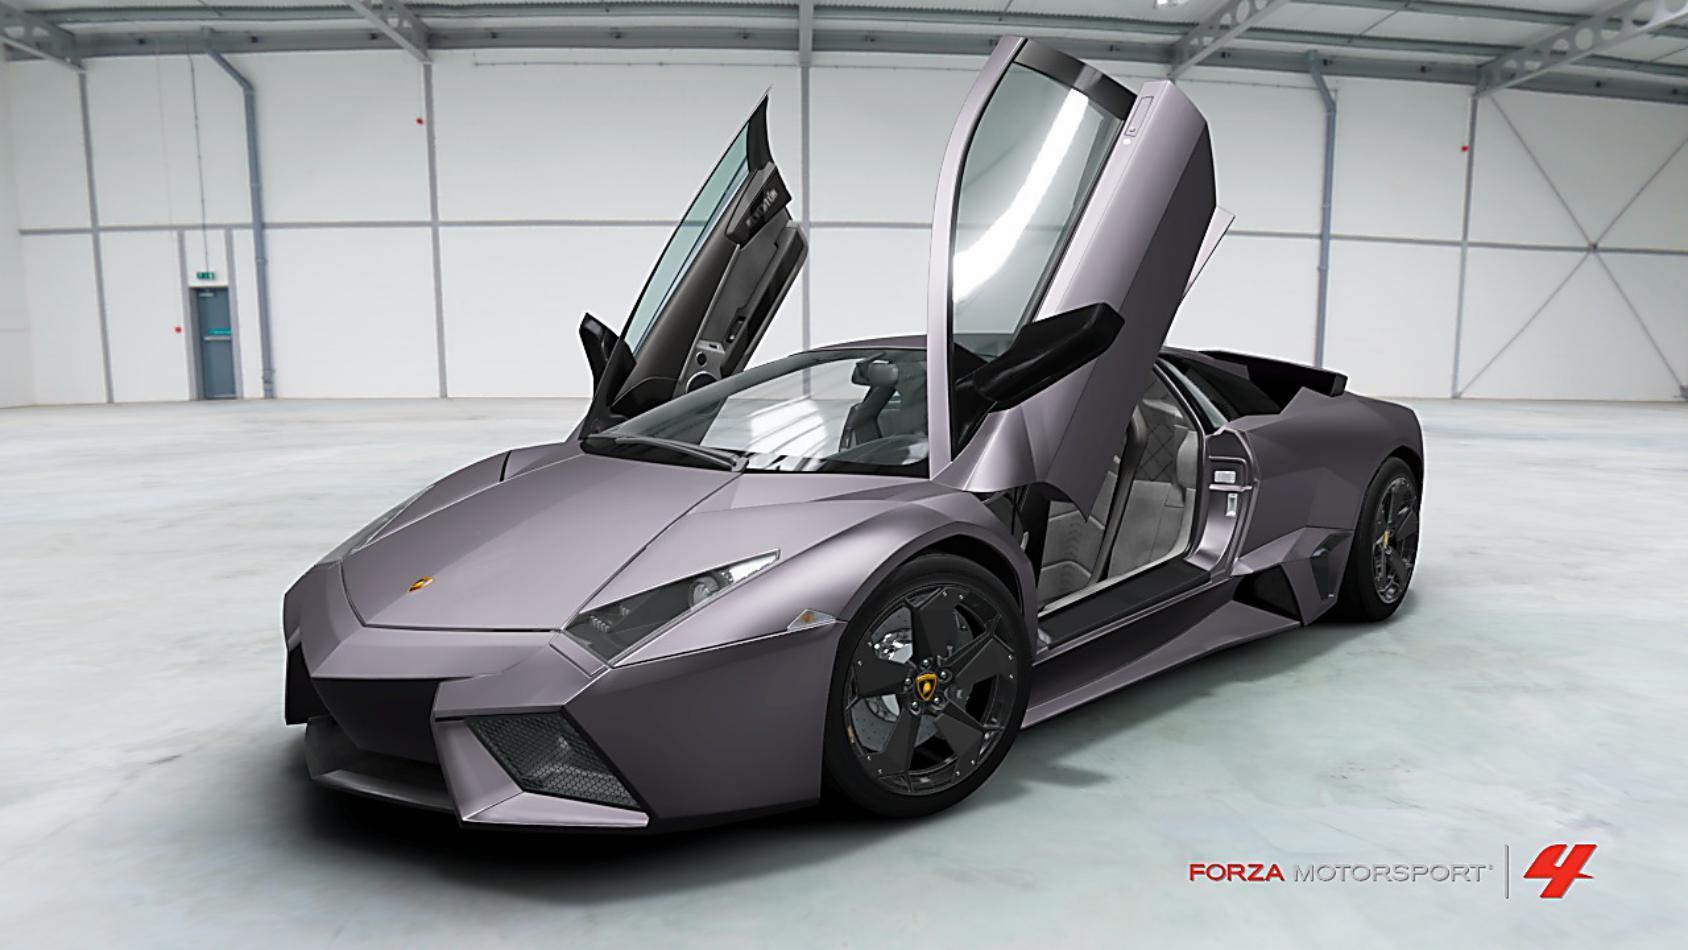 Lamborghini Reventon Wallpapers 2016 - Wallpaper Cave